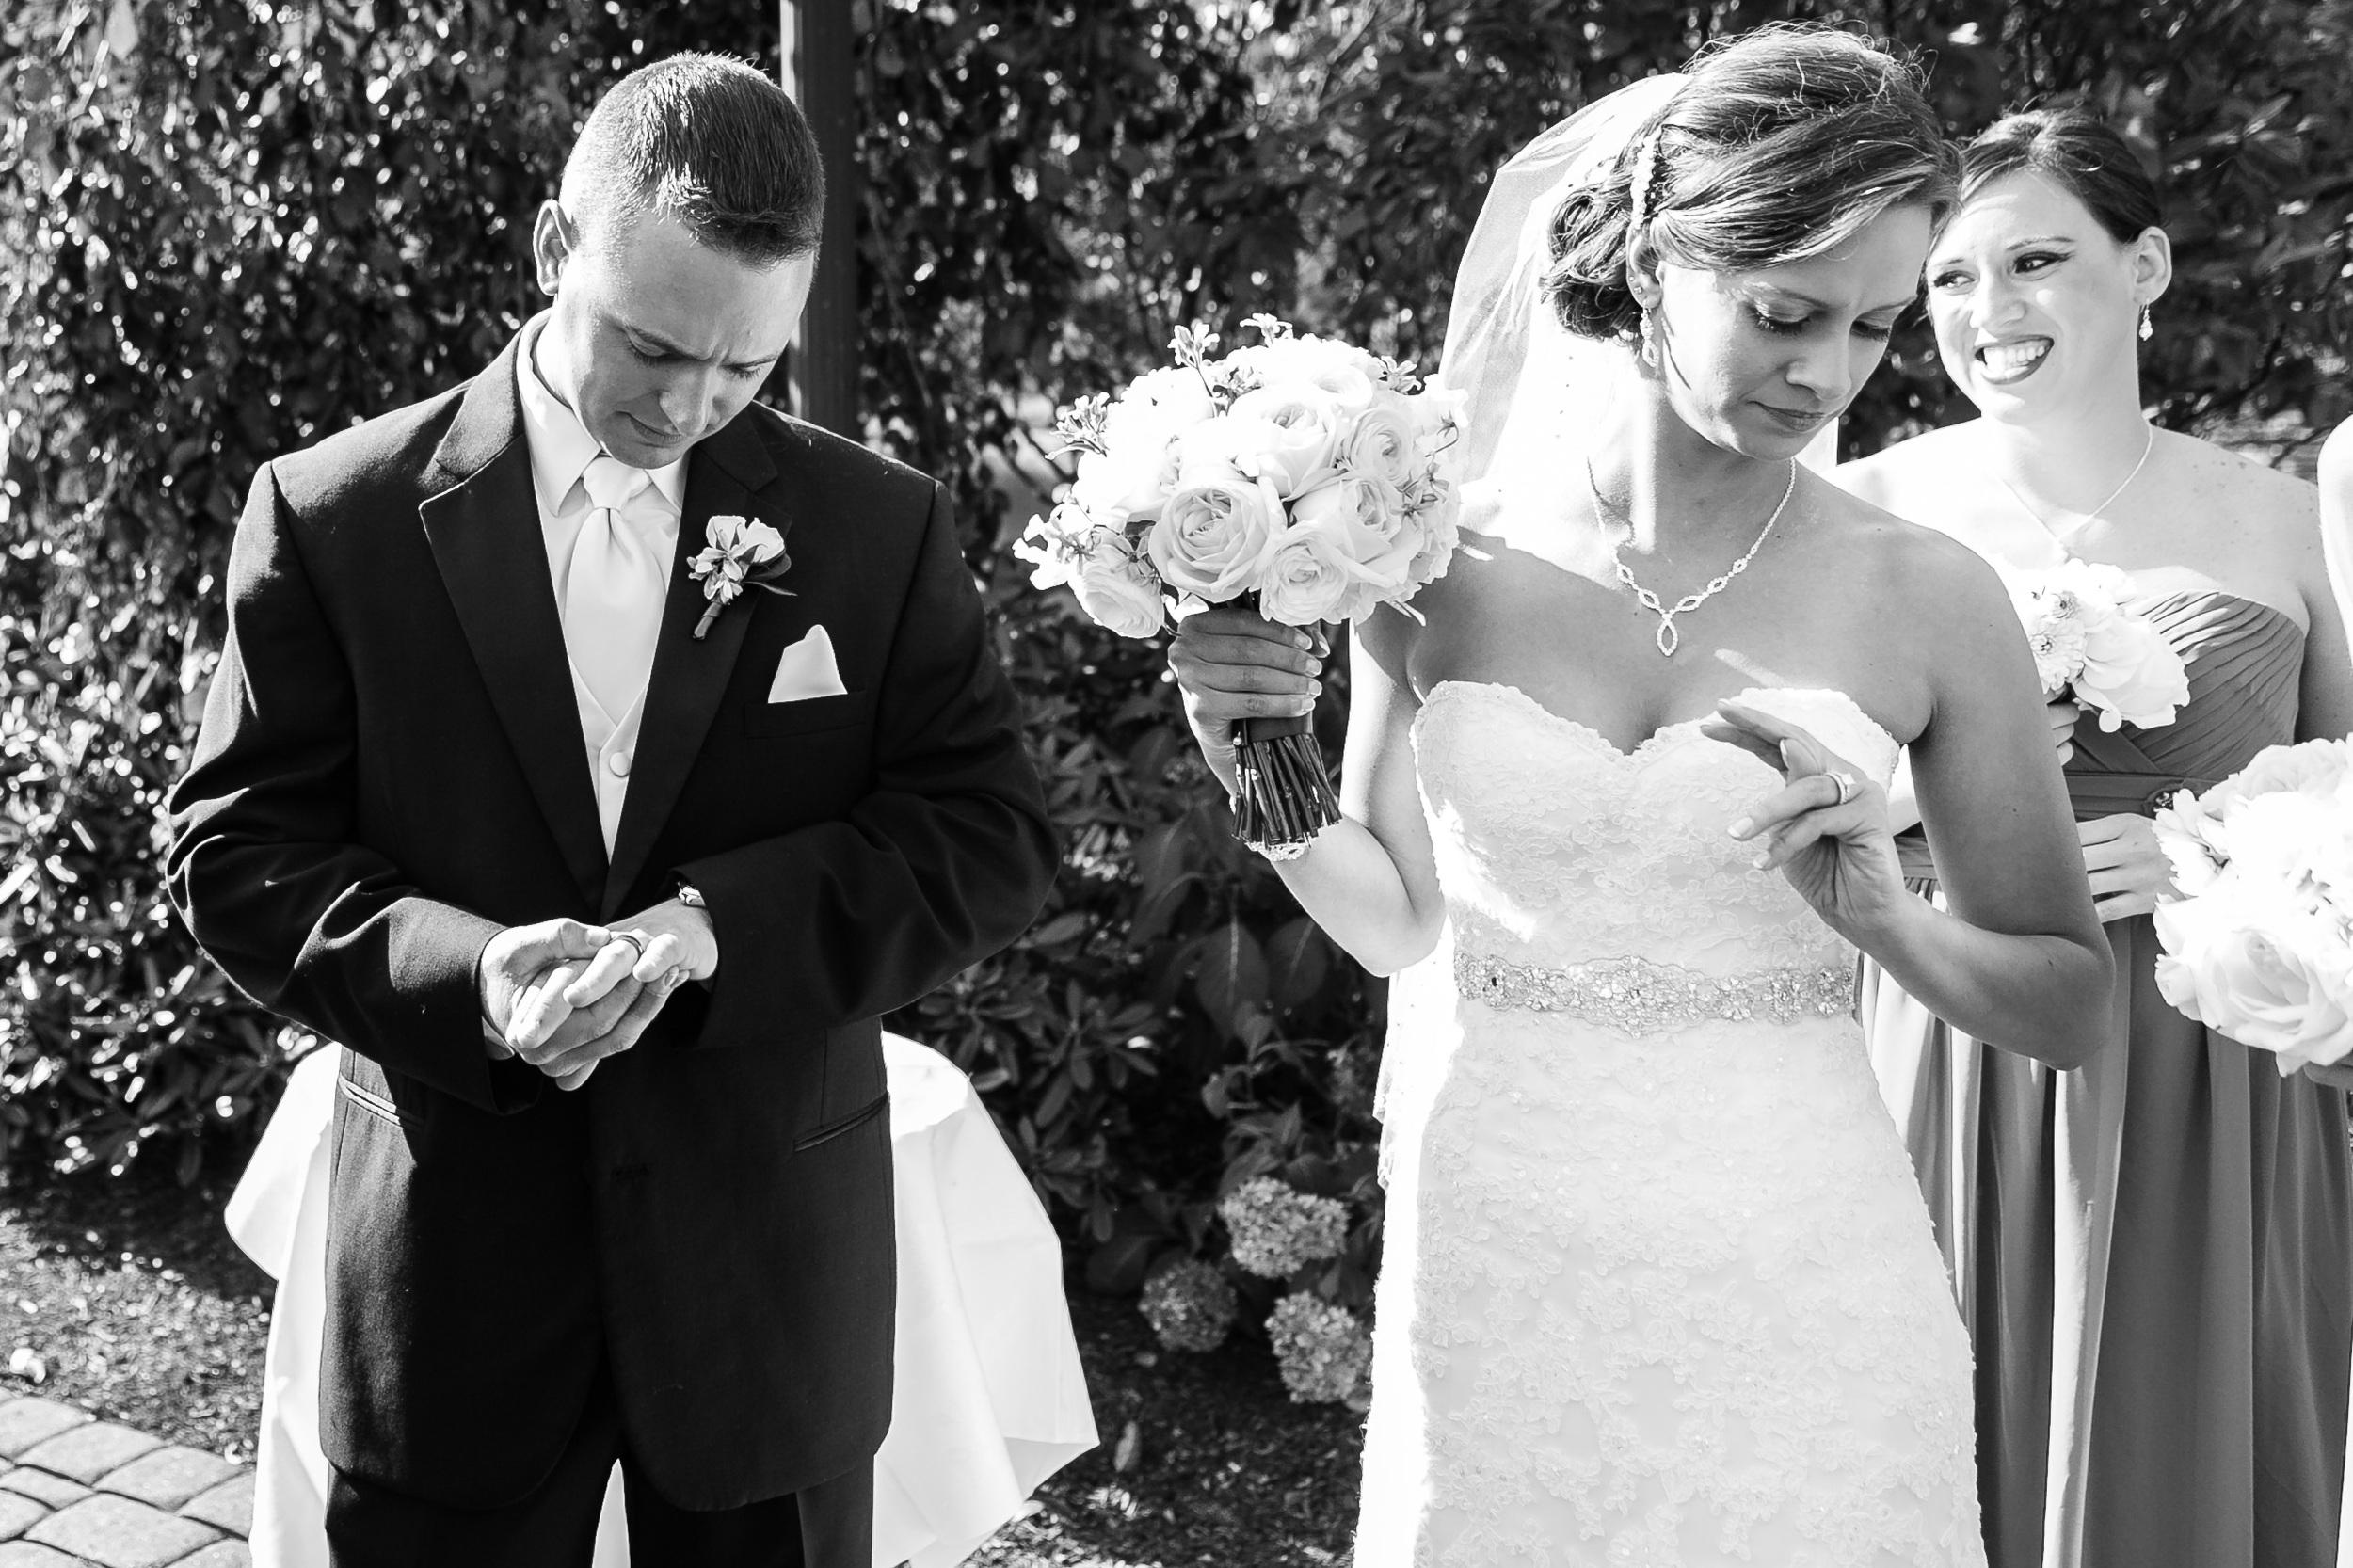 Romantic-Wedding-Aqua-Turf-Connecticut-Photojournalistic-Photography-by-Jacek-Dolata-8.jpg